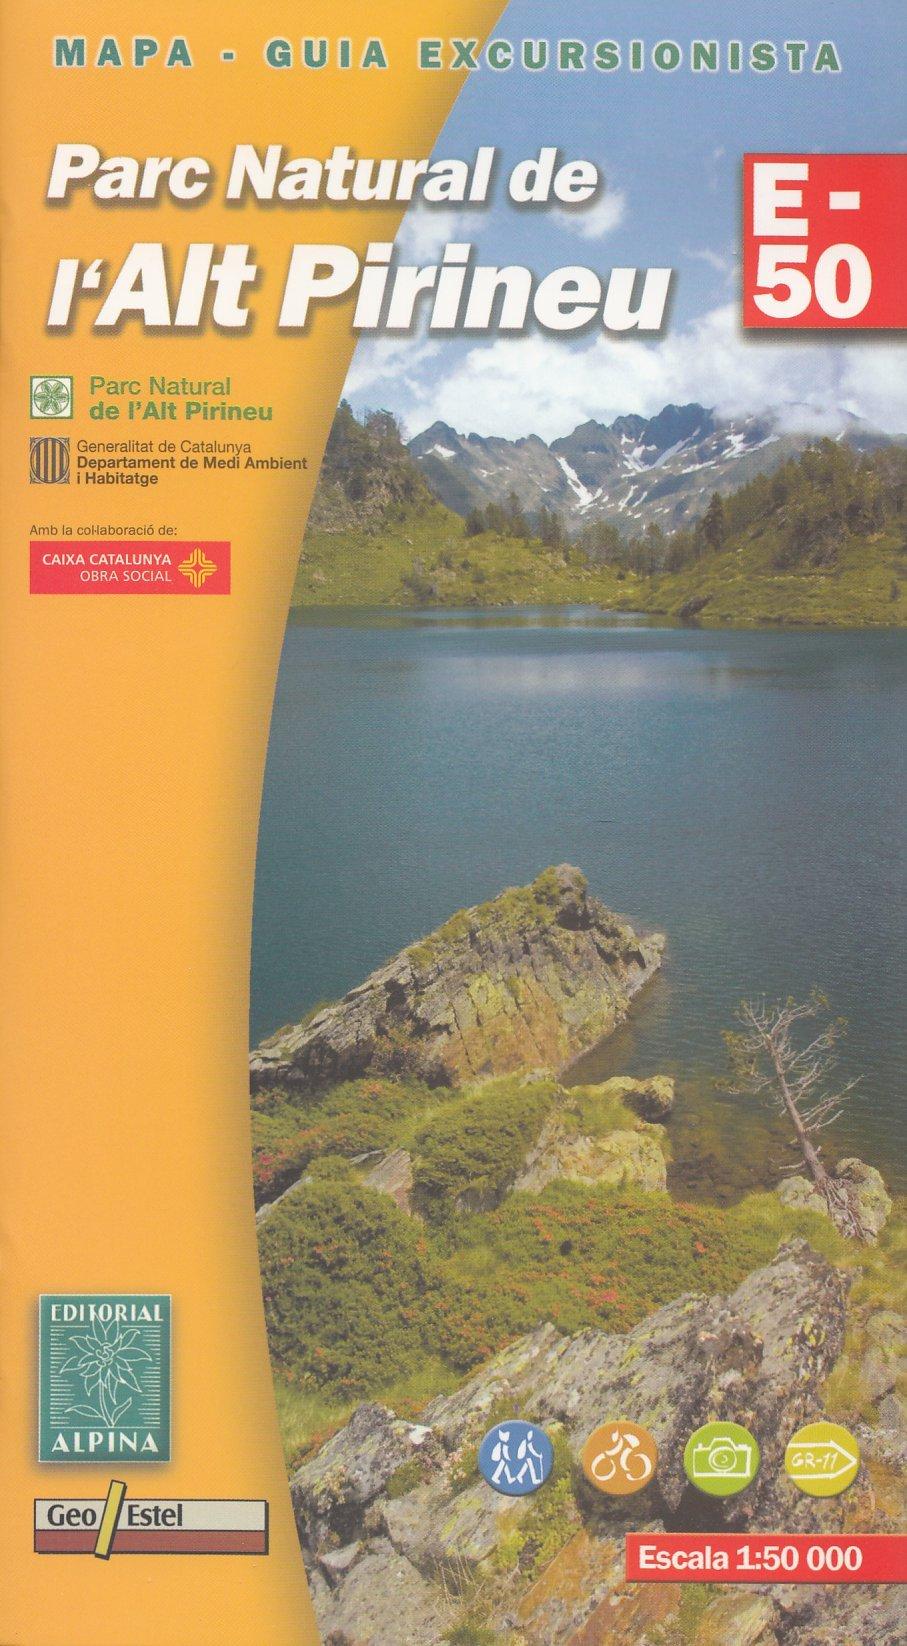 Parc Natural de lAlt Pirineu 1:50.000 senderismo topográfico ...